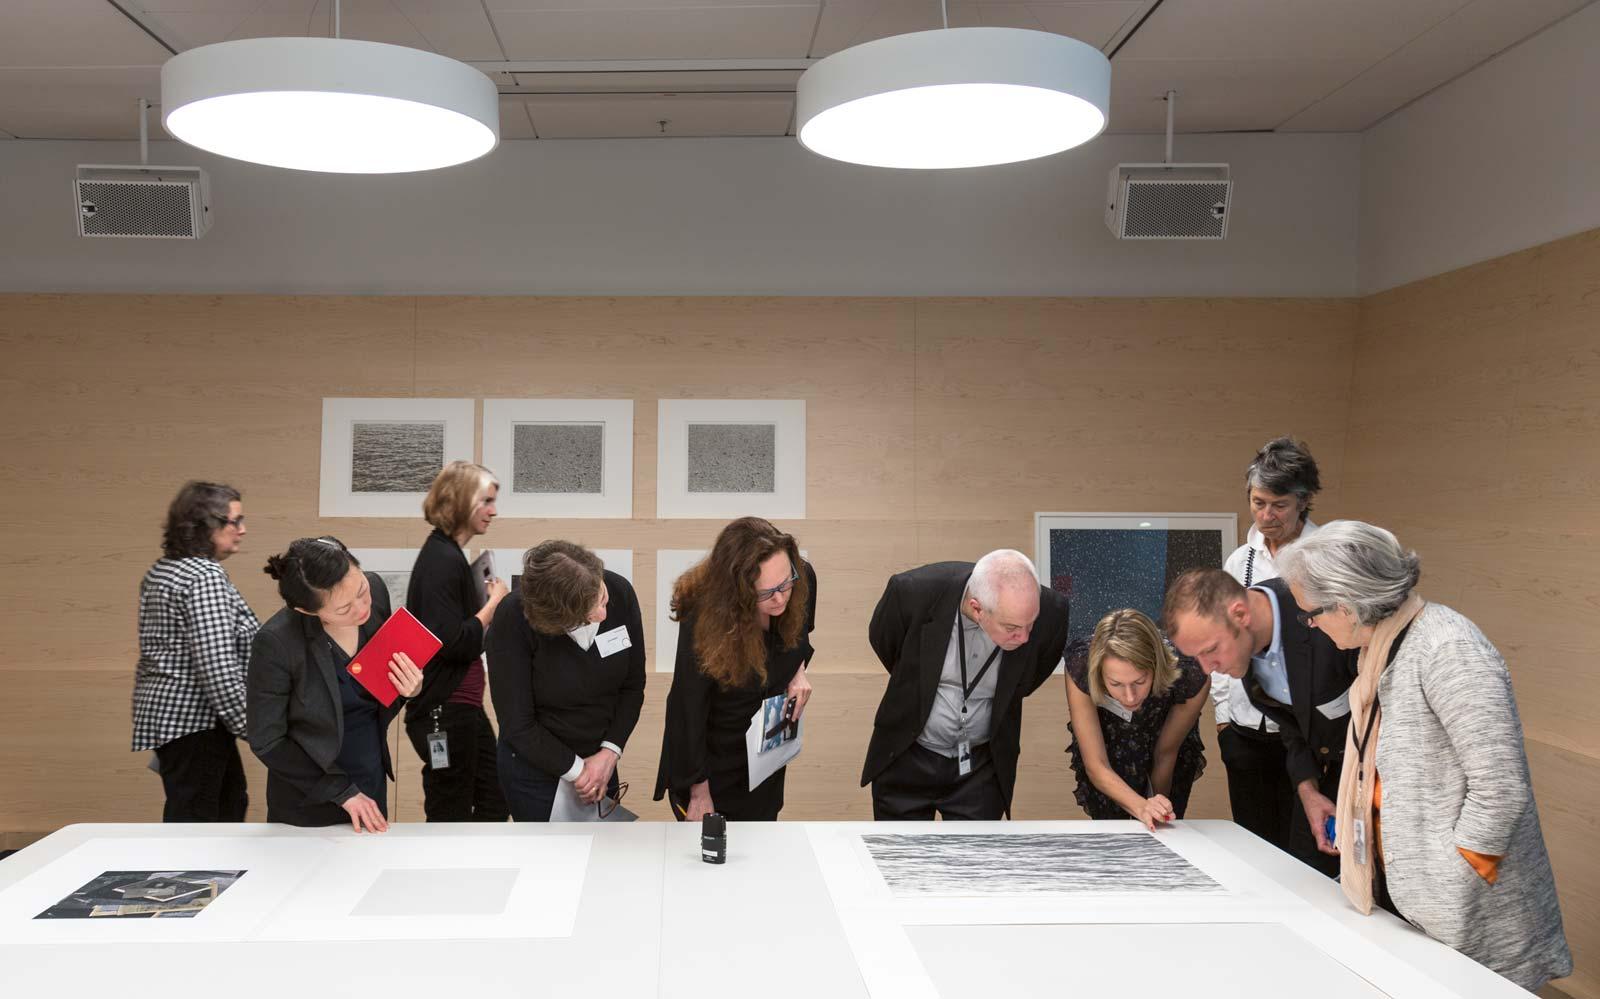 Figure 2. A cross-departmental team examines works on paper by artist Vija Celmins at SFMOMA in 2017.